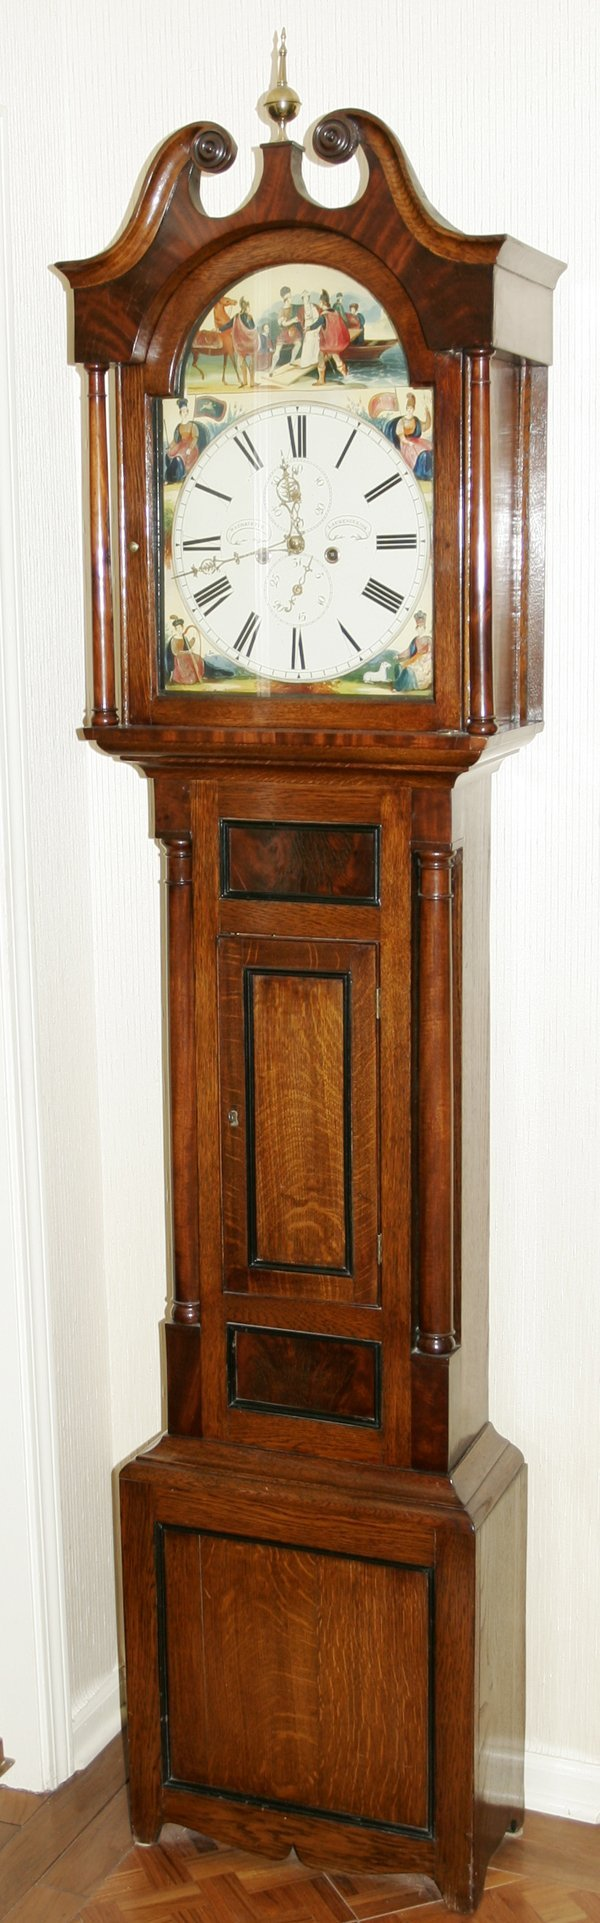 101009: WILLIAM CHRISTIE-LAURENCE KIRK OAK TALL CLOCK